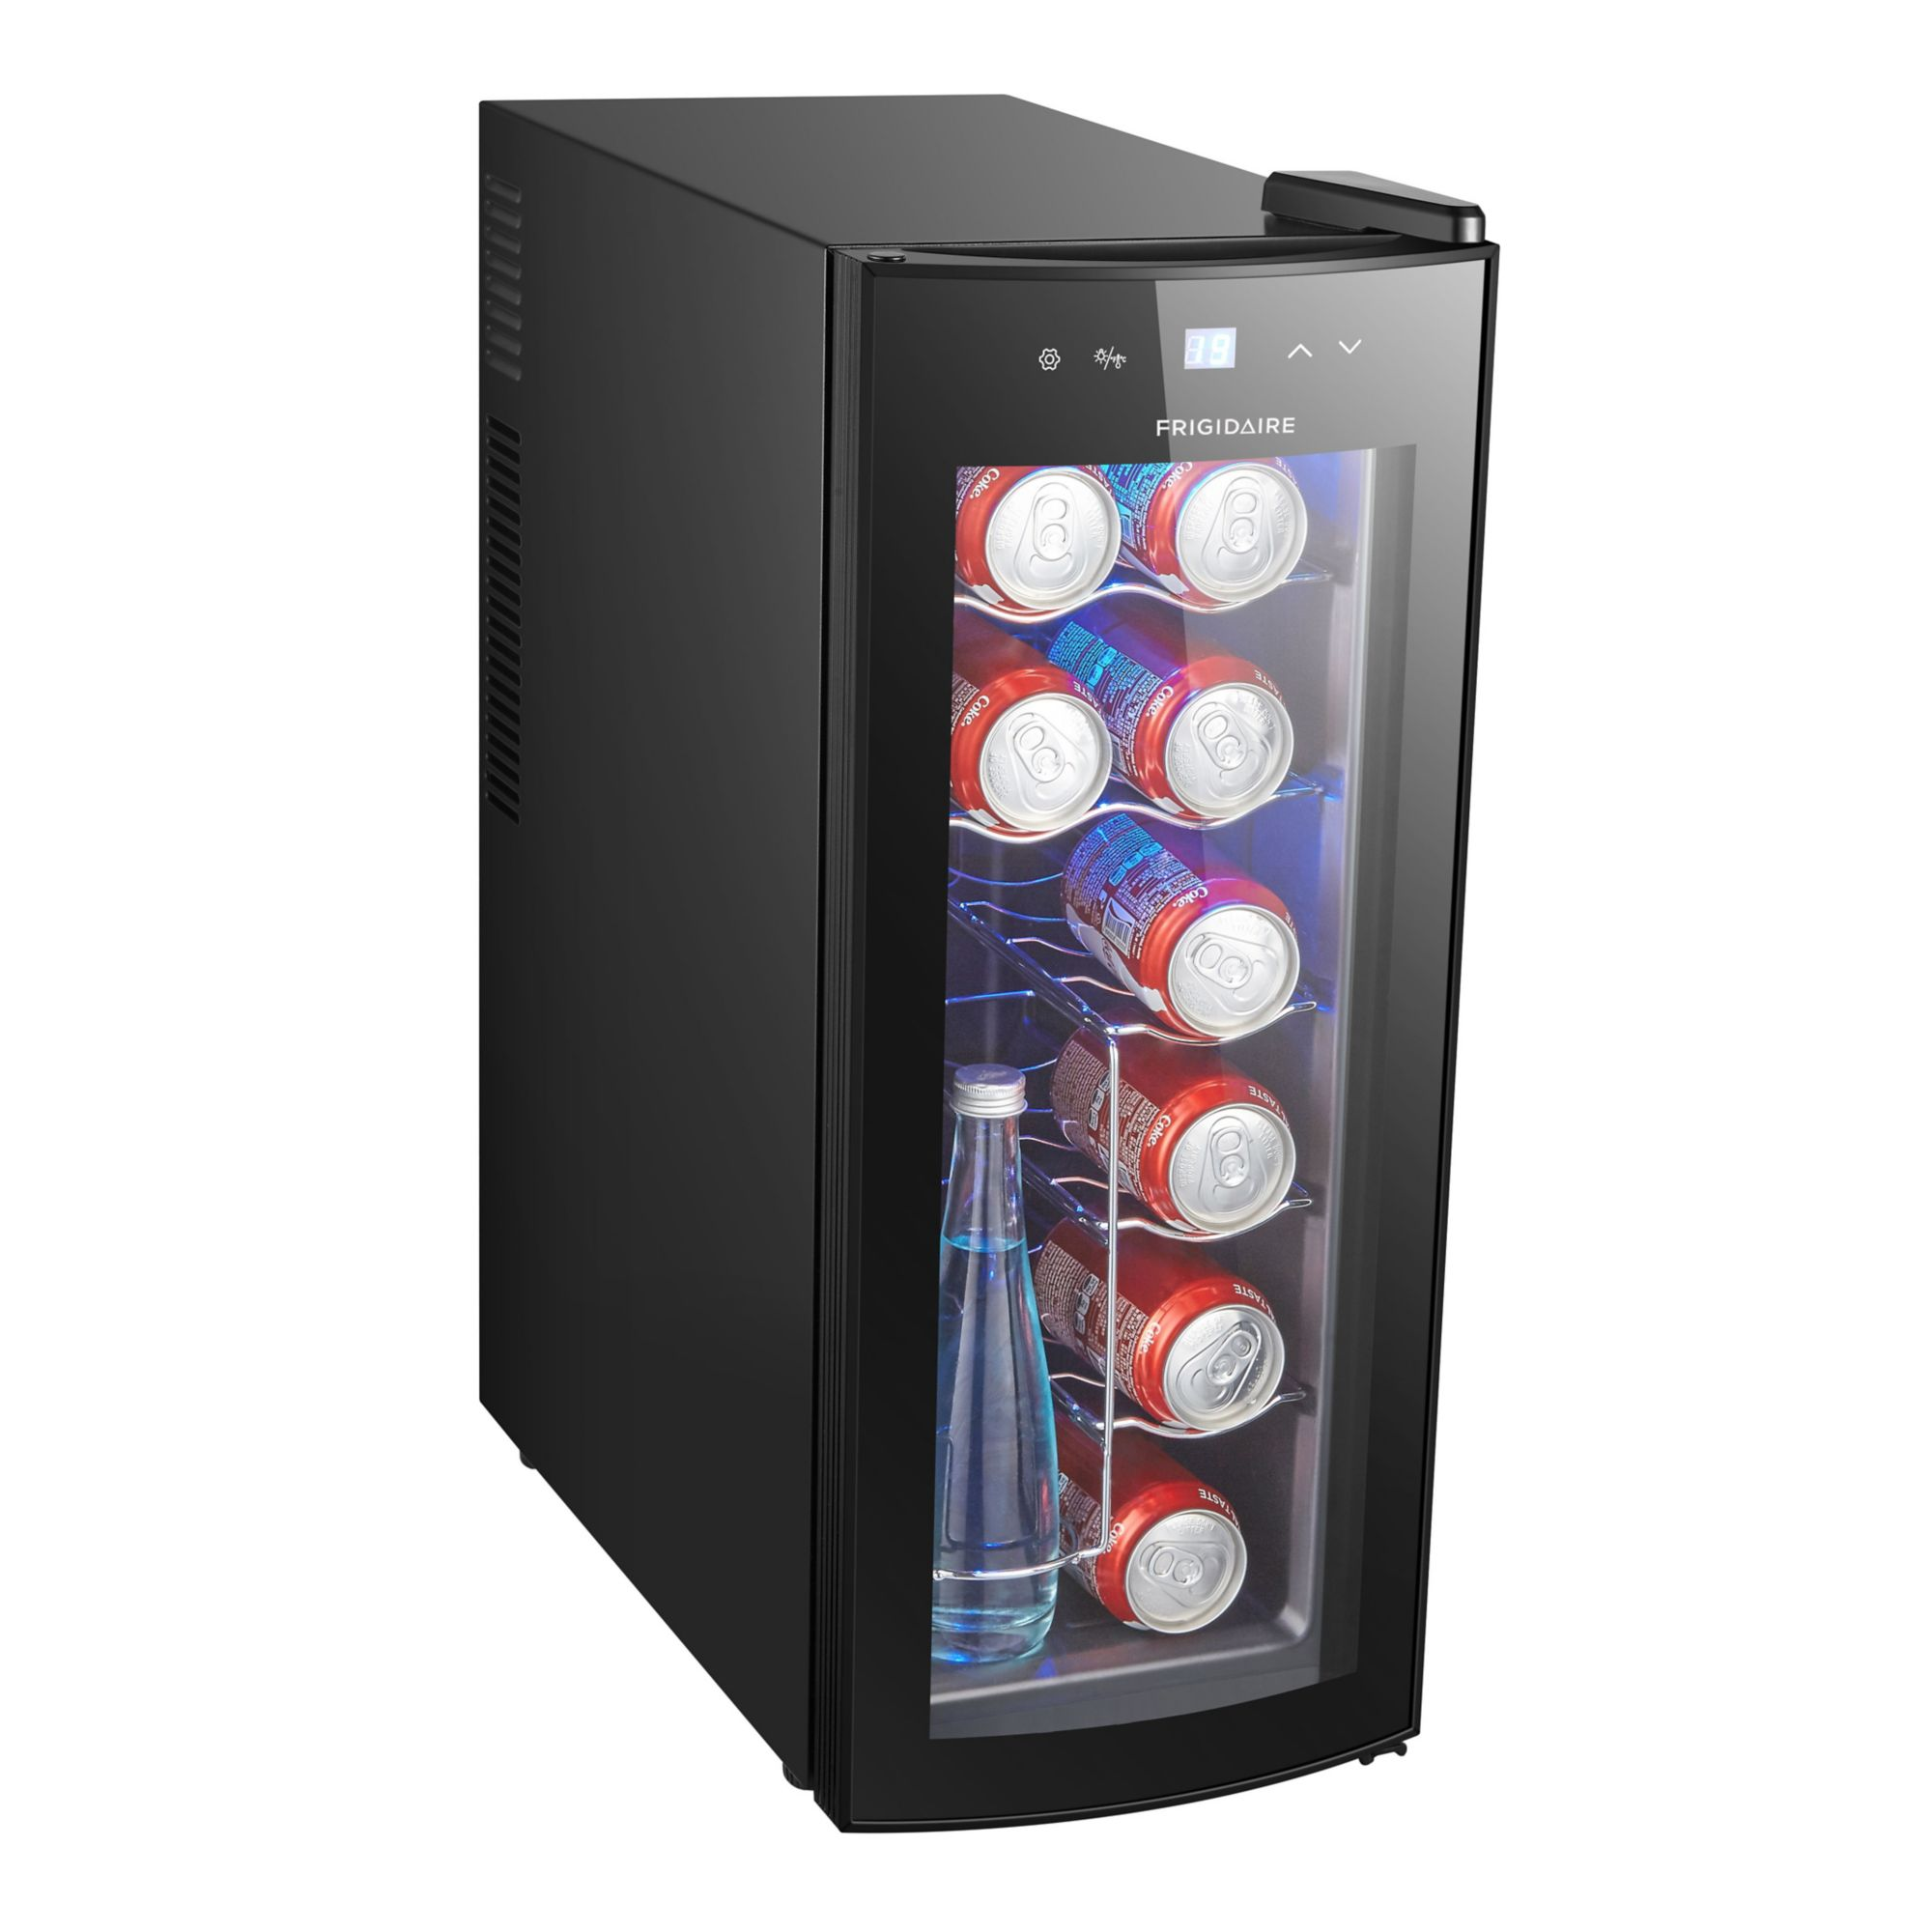 Frigidaire 12 Bottle 26 Can Curved Door Beverage Cooler Bjs Wholesale Club